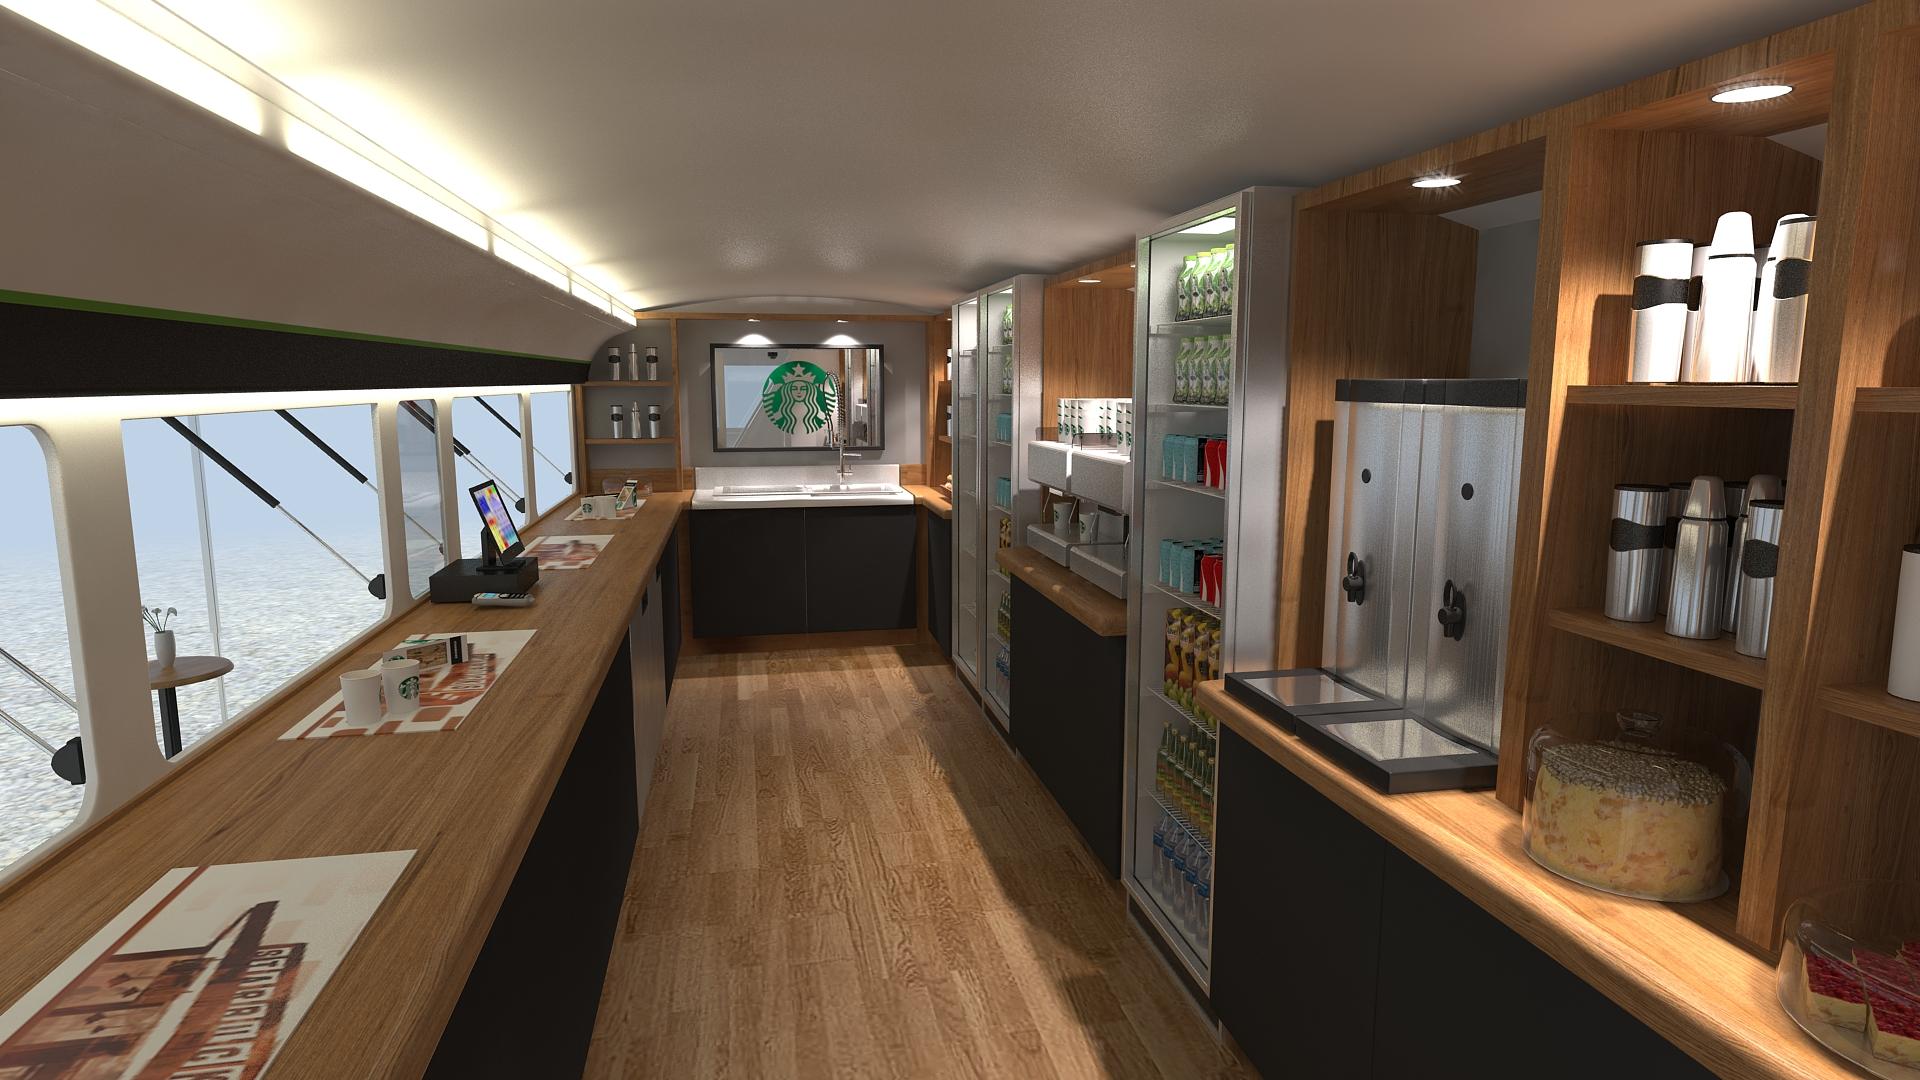 Starbucks Grd Interior_02.jpg